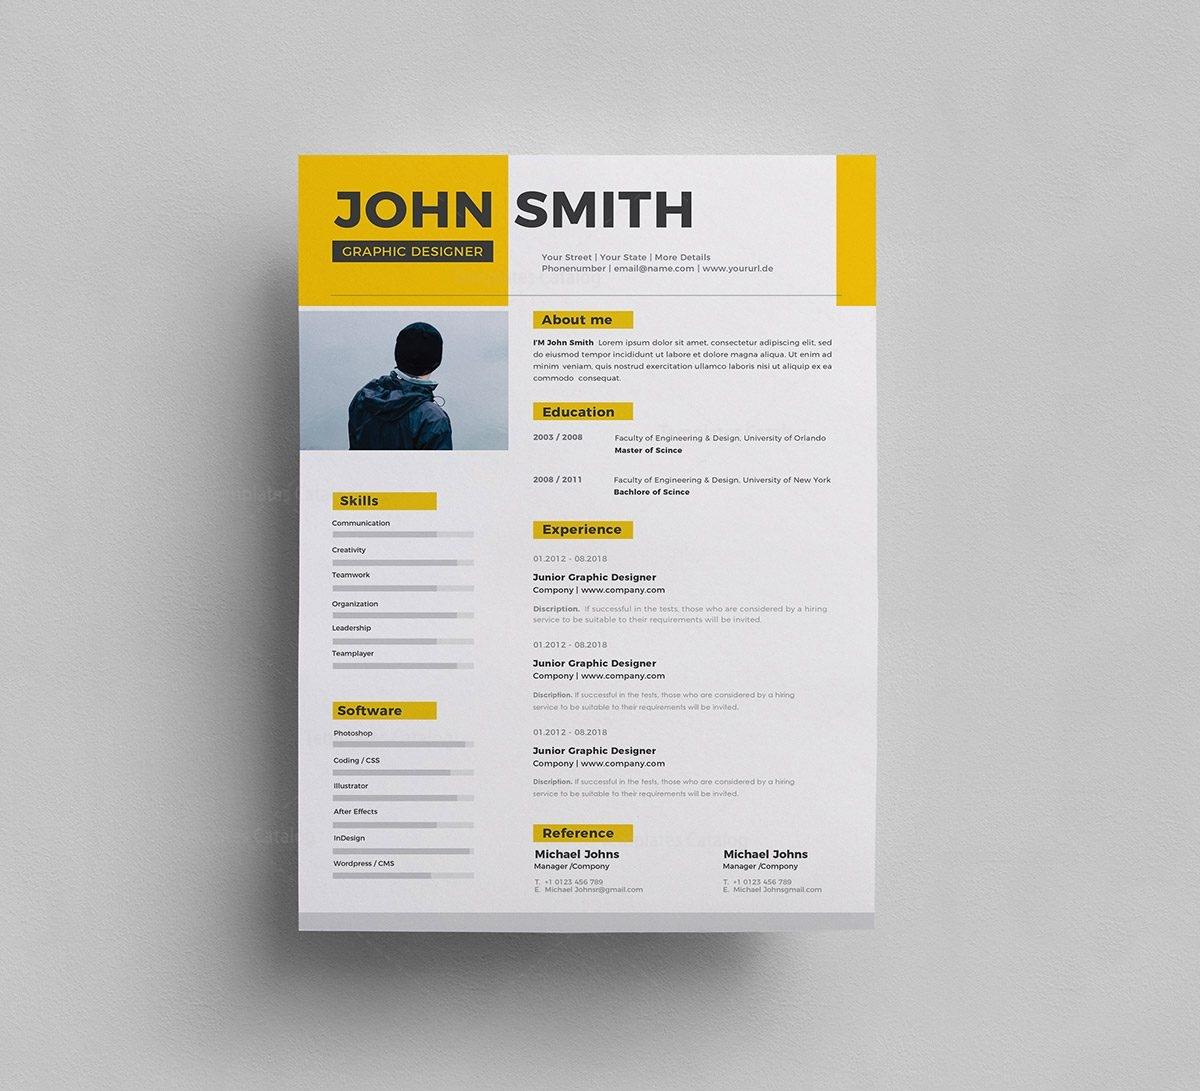 psd resume templates - Roberto.mattni.co